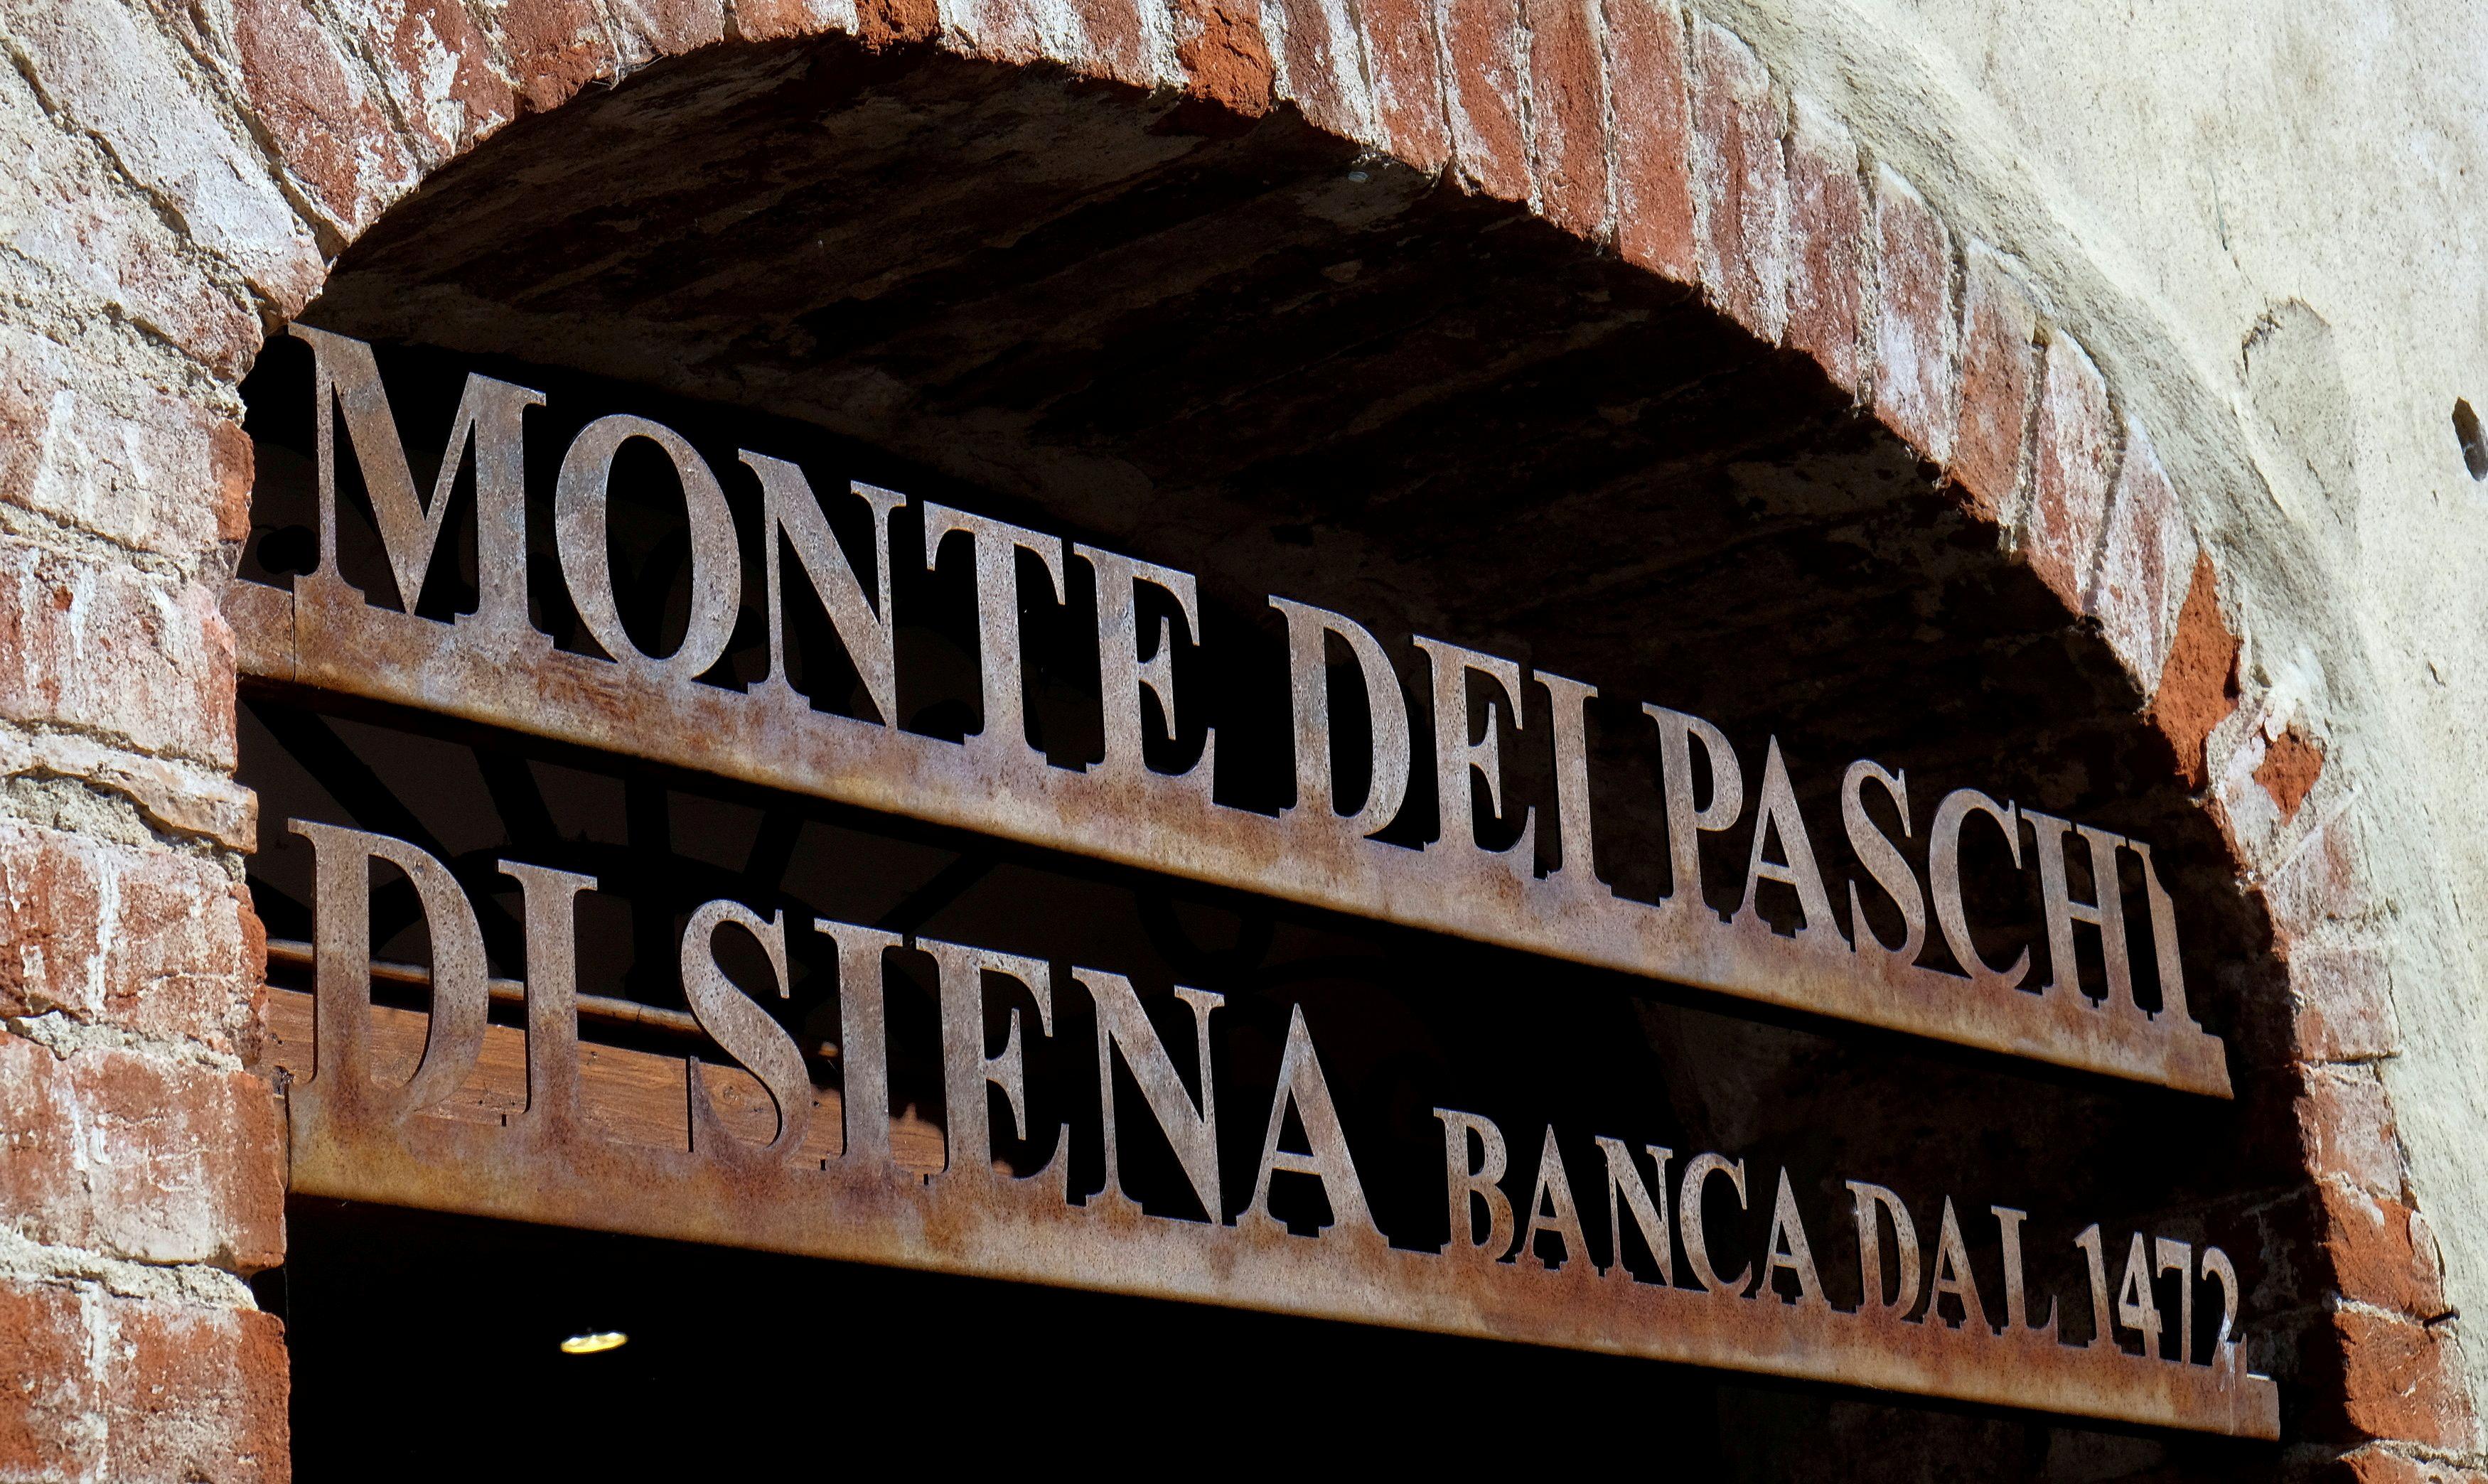 The entrance to Italian bank Monte Dei Paschi di Siena is seen in San Gusme near Siena, Italy, September 29, 2016.  REUTERS/Stefano Rellandini/File Photo